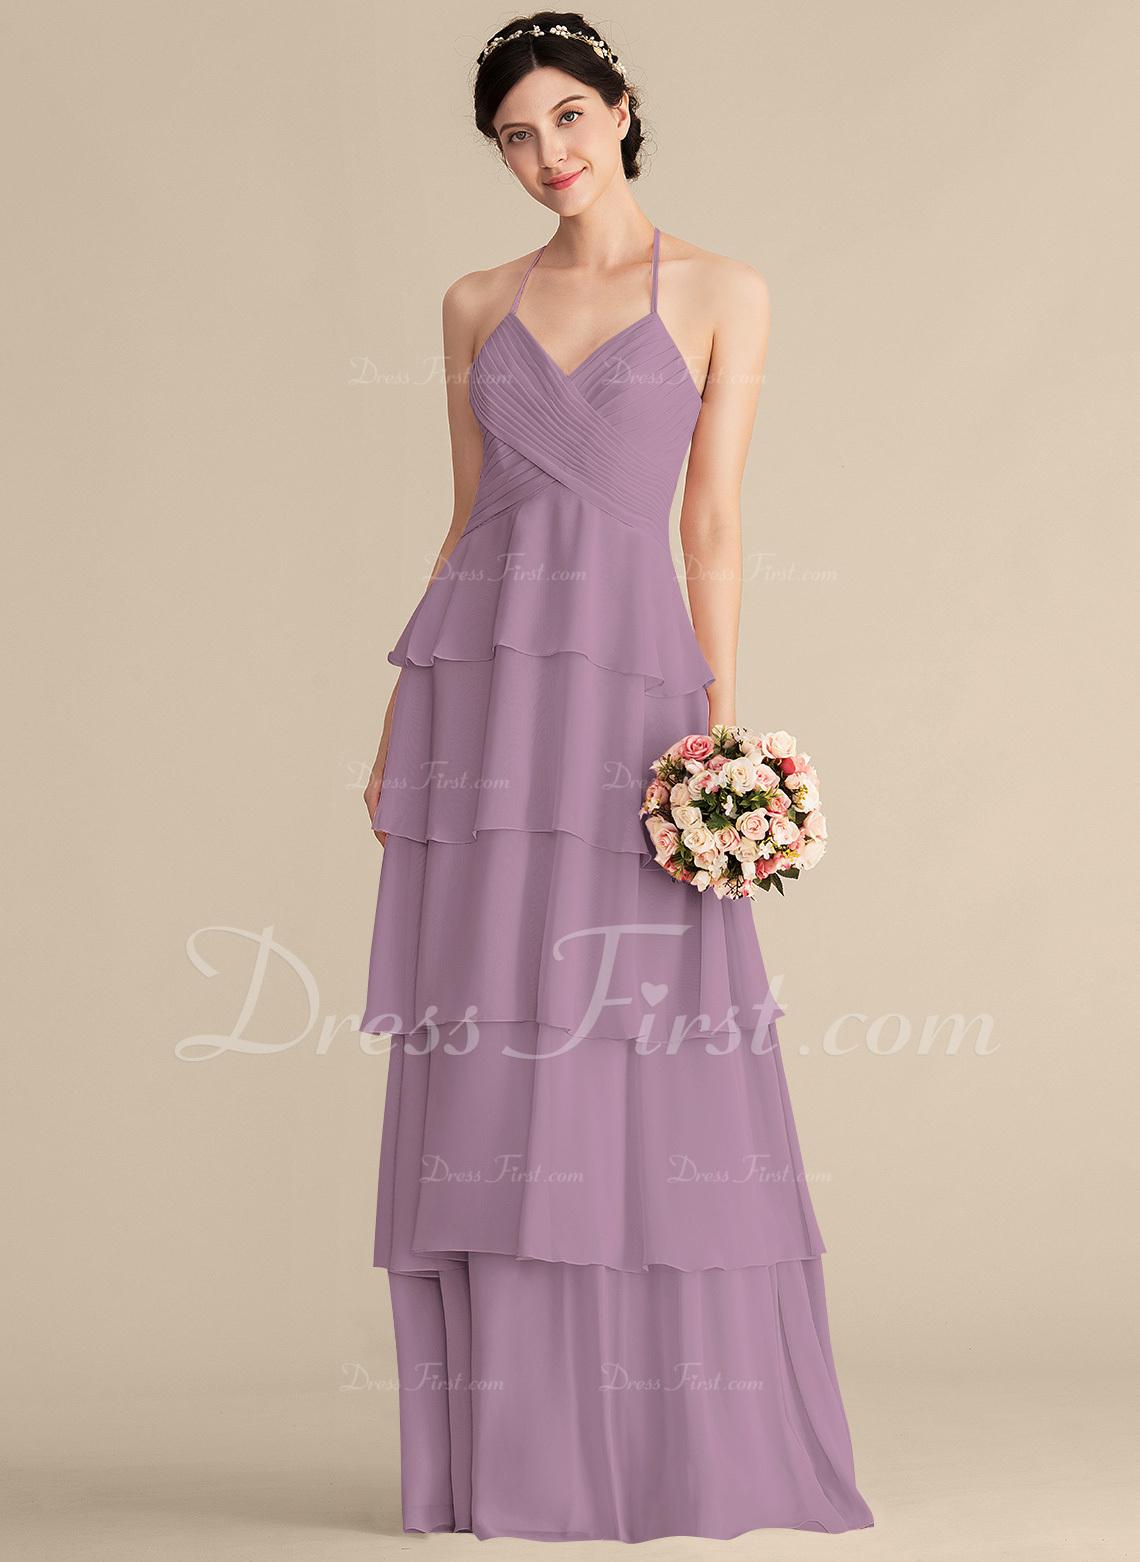 115925617f4ec Loading zoom. Loading. A-Line/Princess Sweetheart Floor-Length Chiffon  Bridesmaid Dress With Cascading Ruffles ...